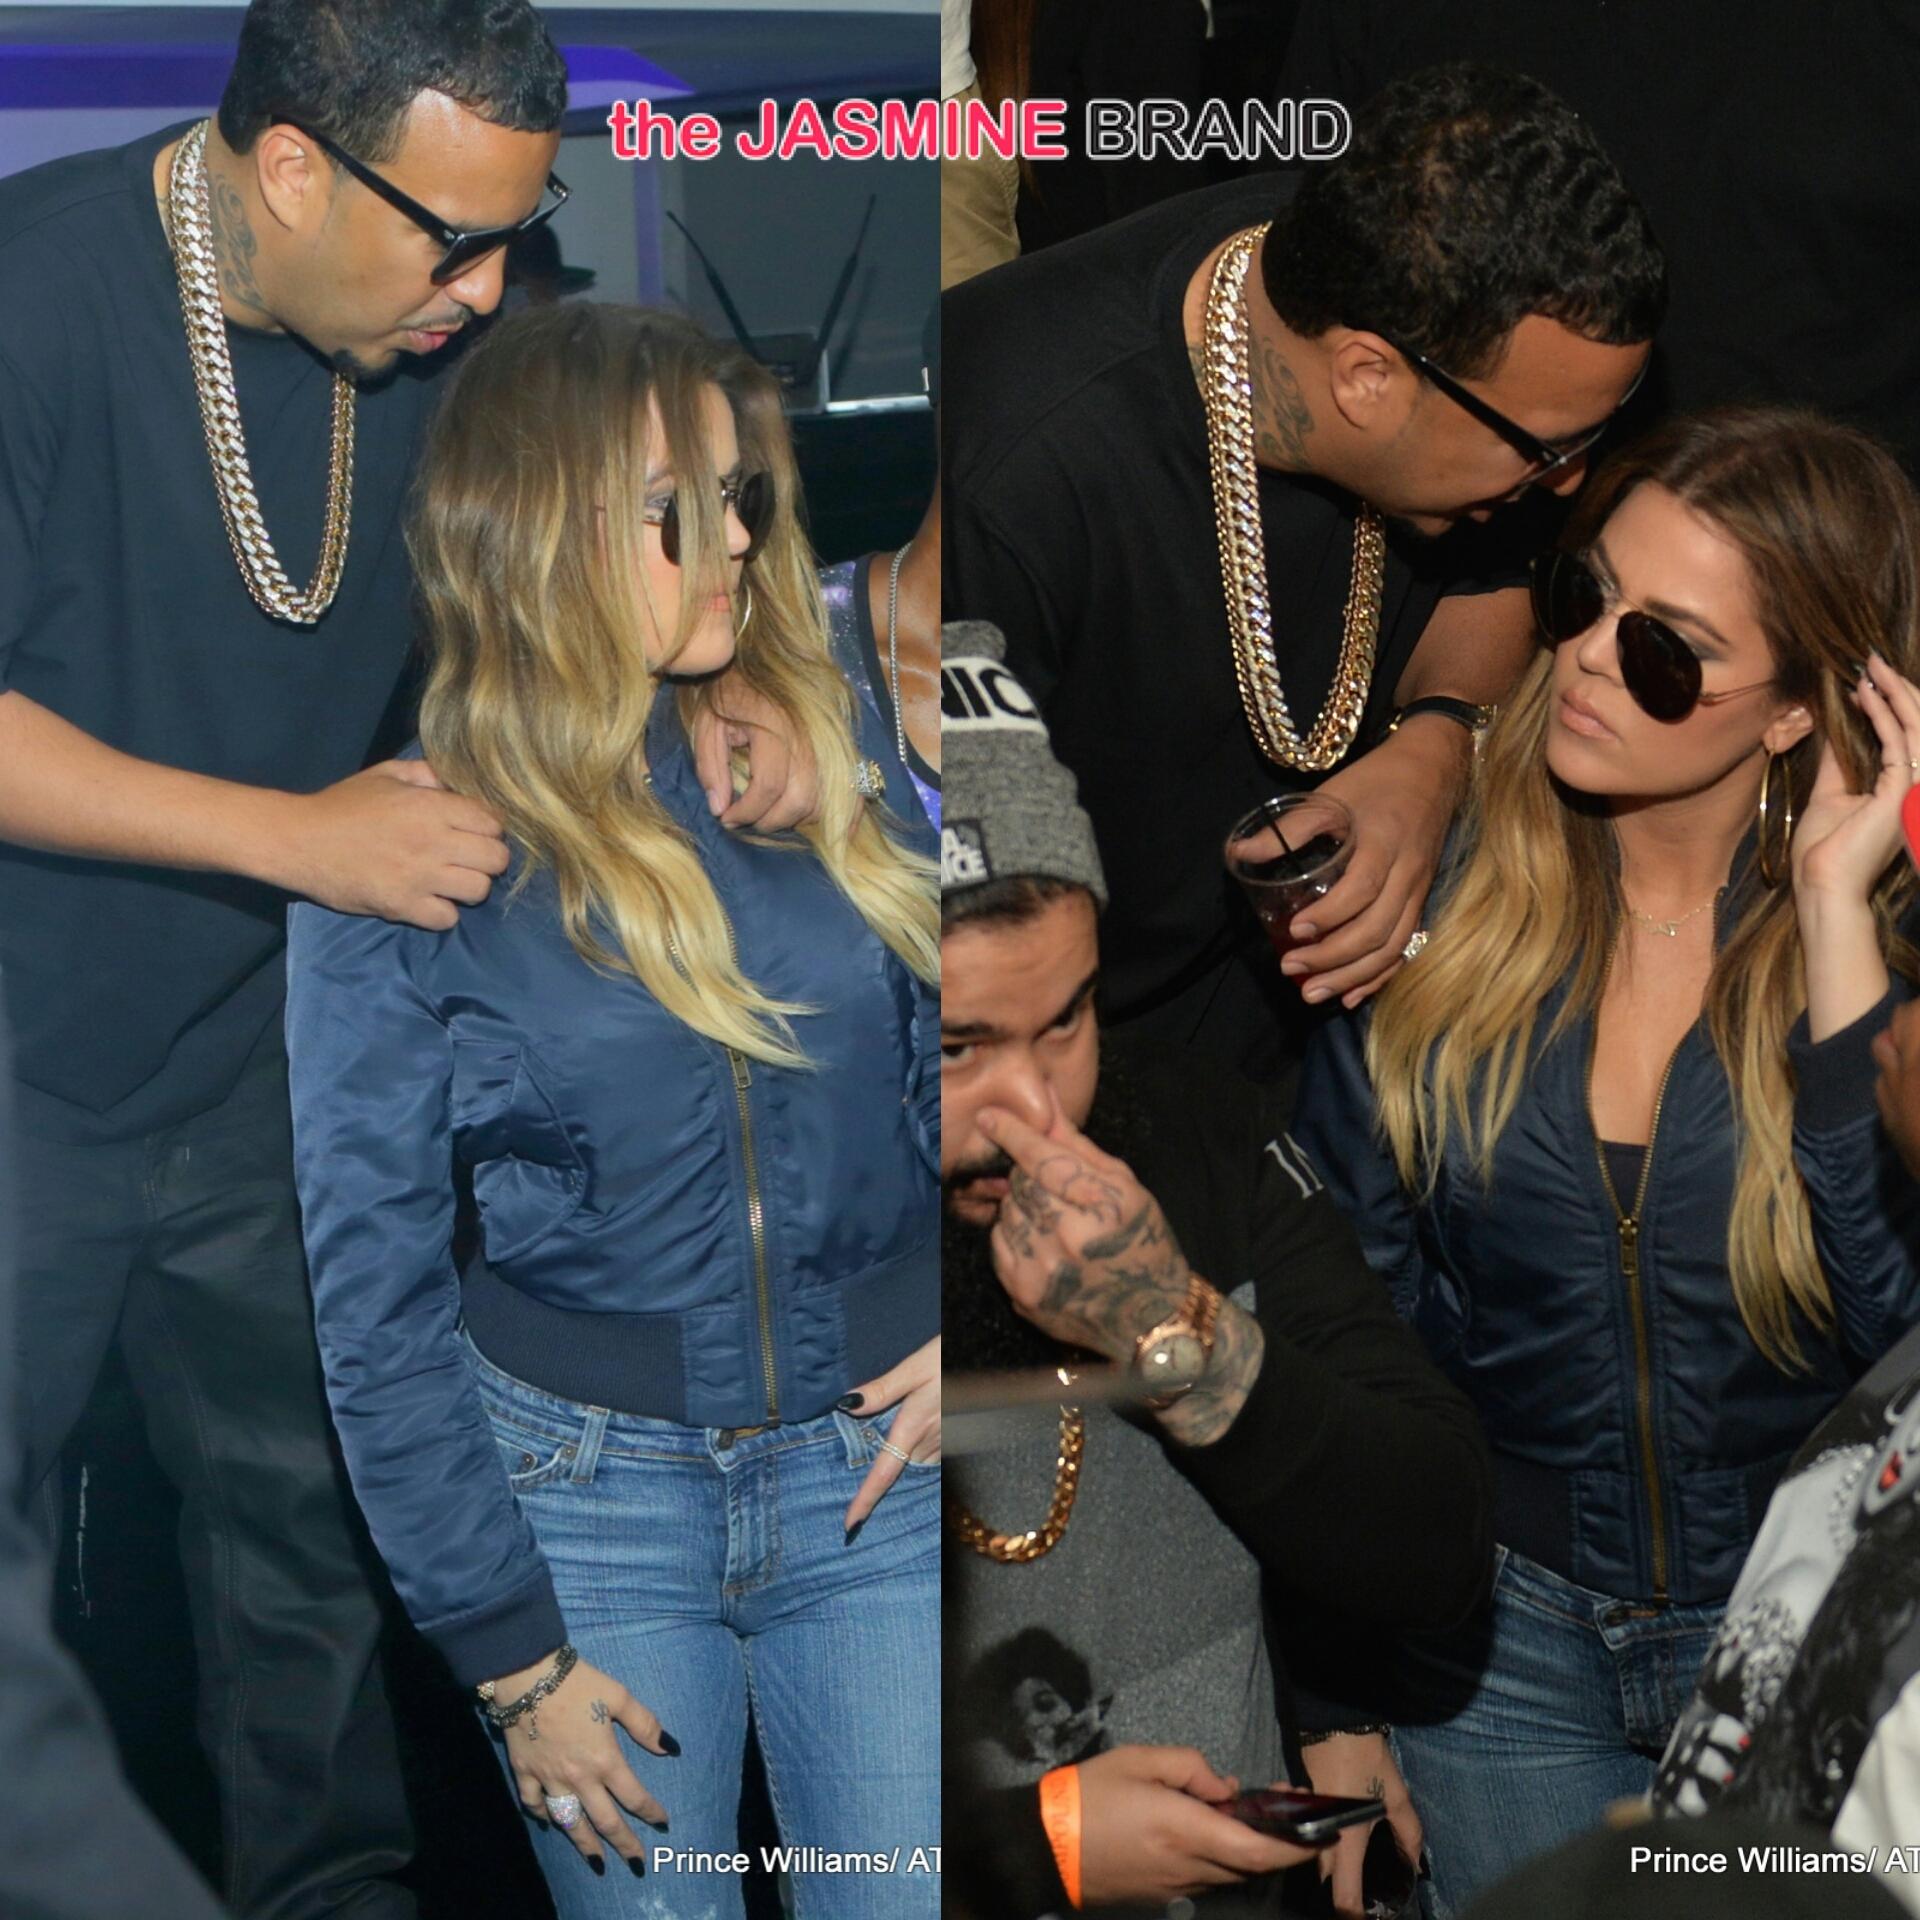 khloe kardashian and french montana relationship rumors